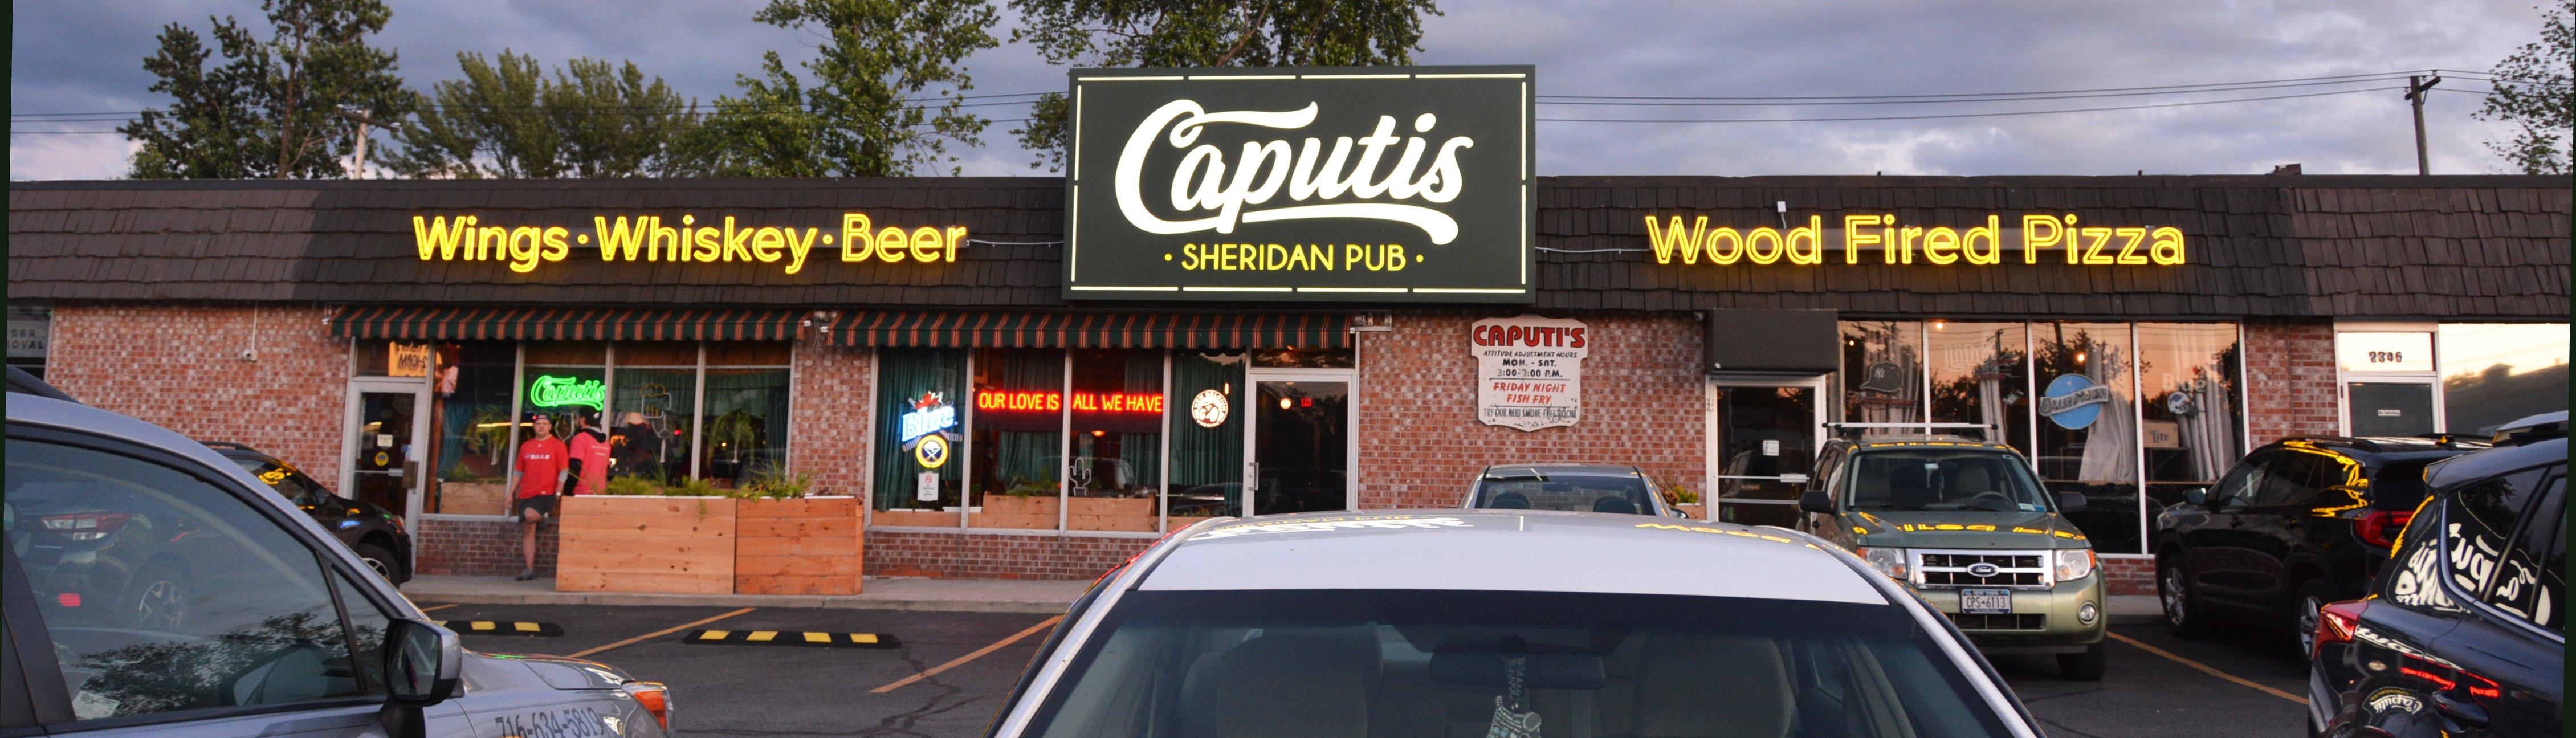 Caputis Sheridan Pub - Illuminated Sign Package